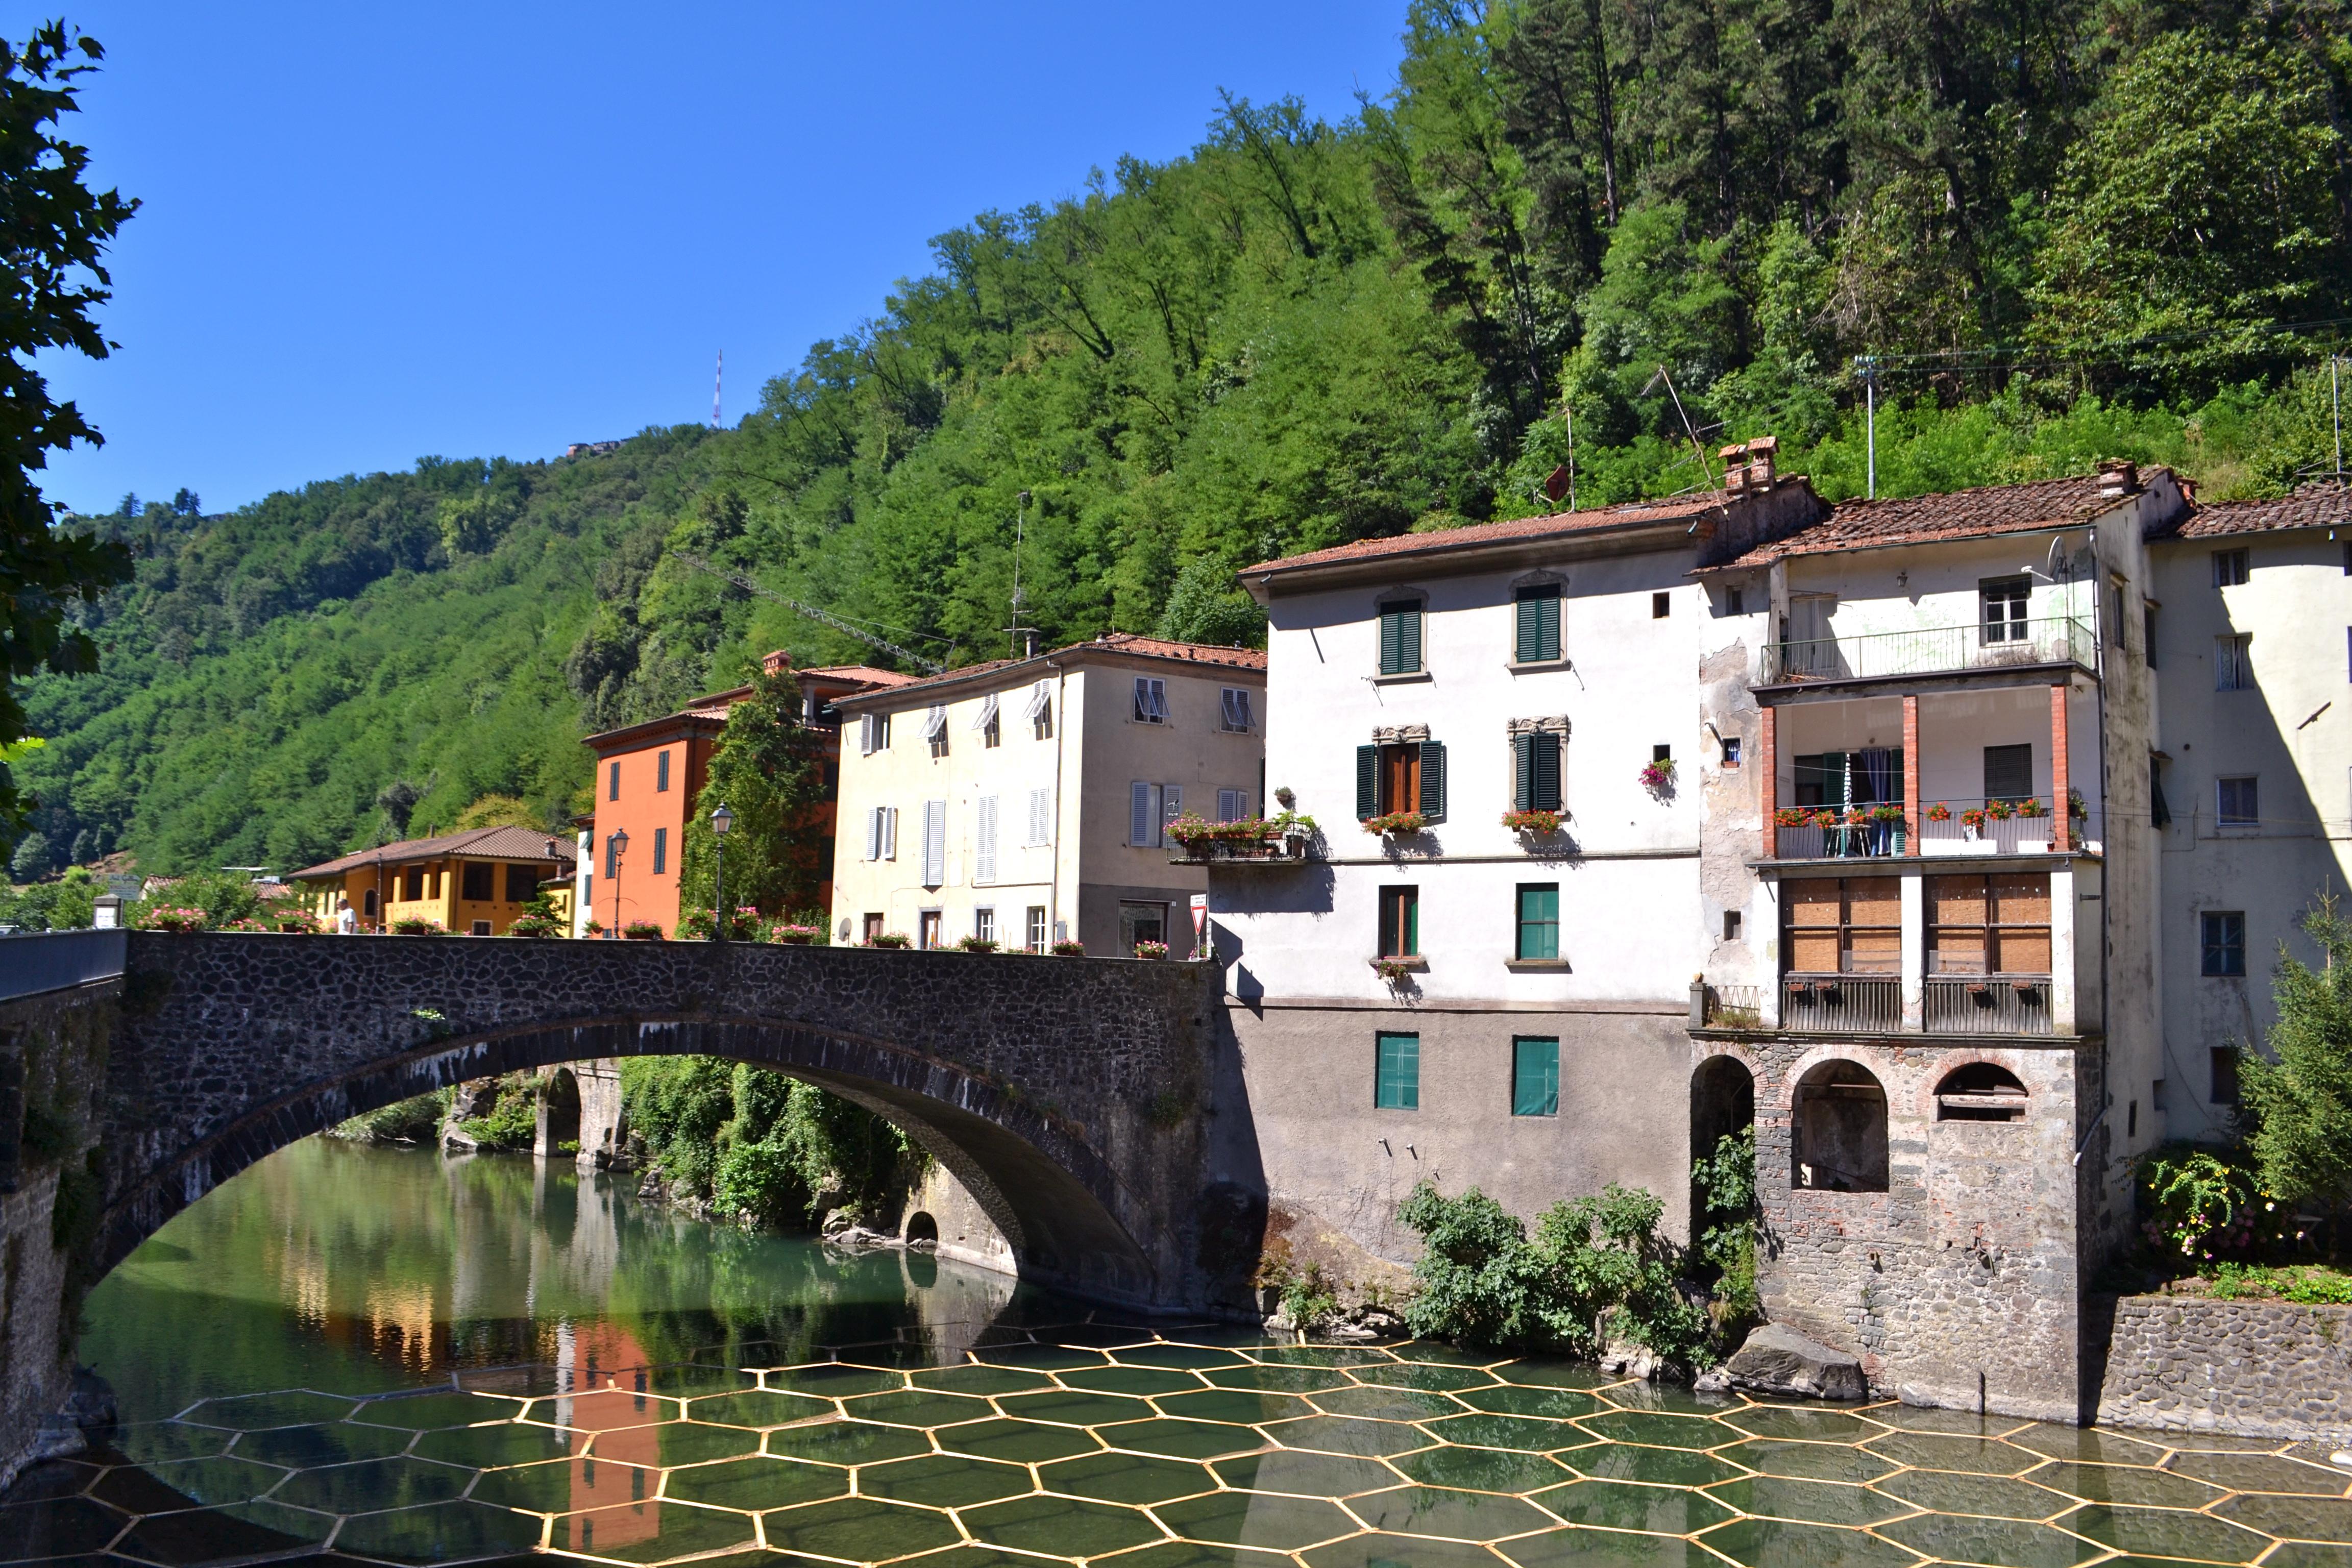 Travel Guide: Lisa eats Bagni Di Lucca and beyond - Lisa Eats World